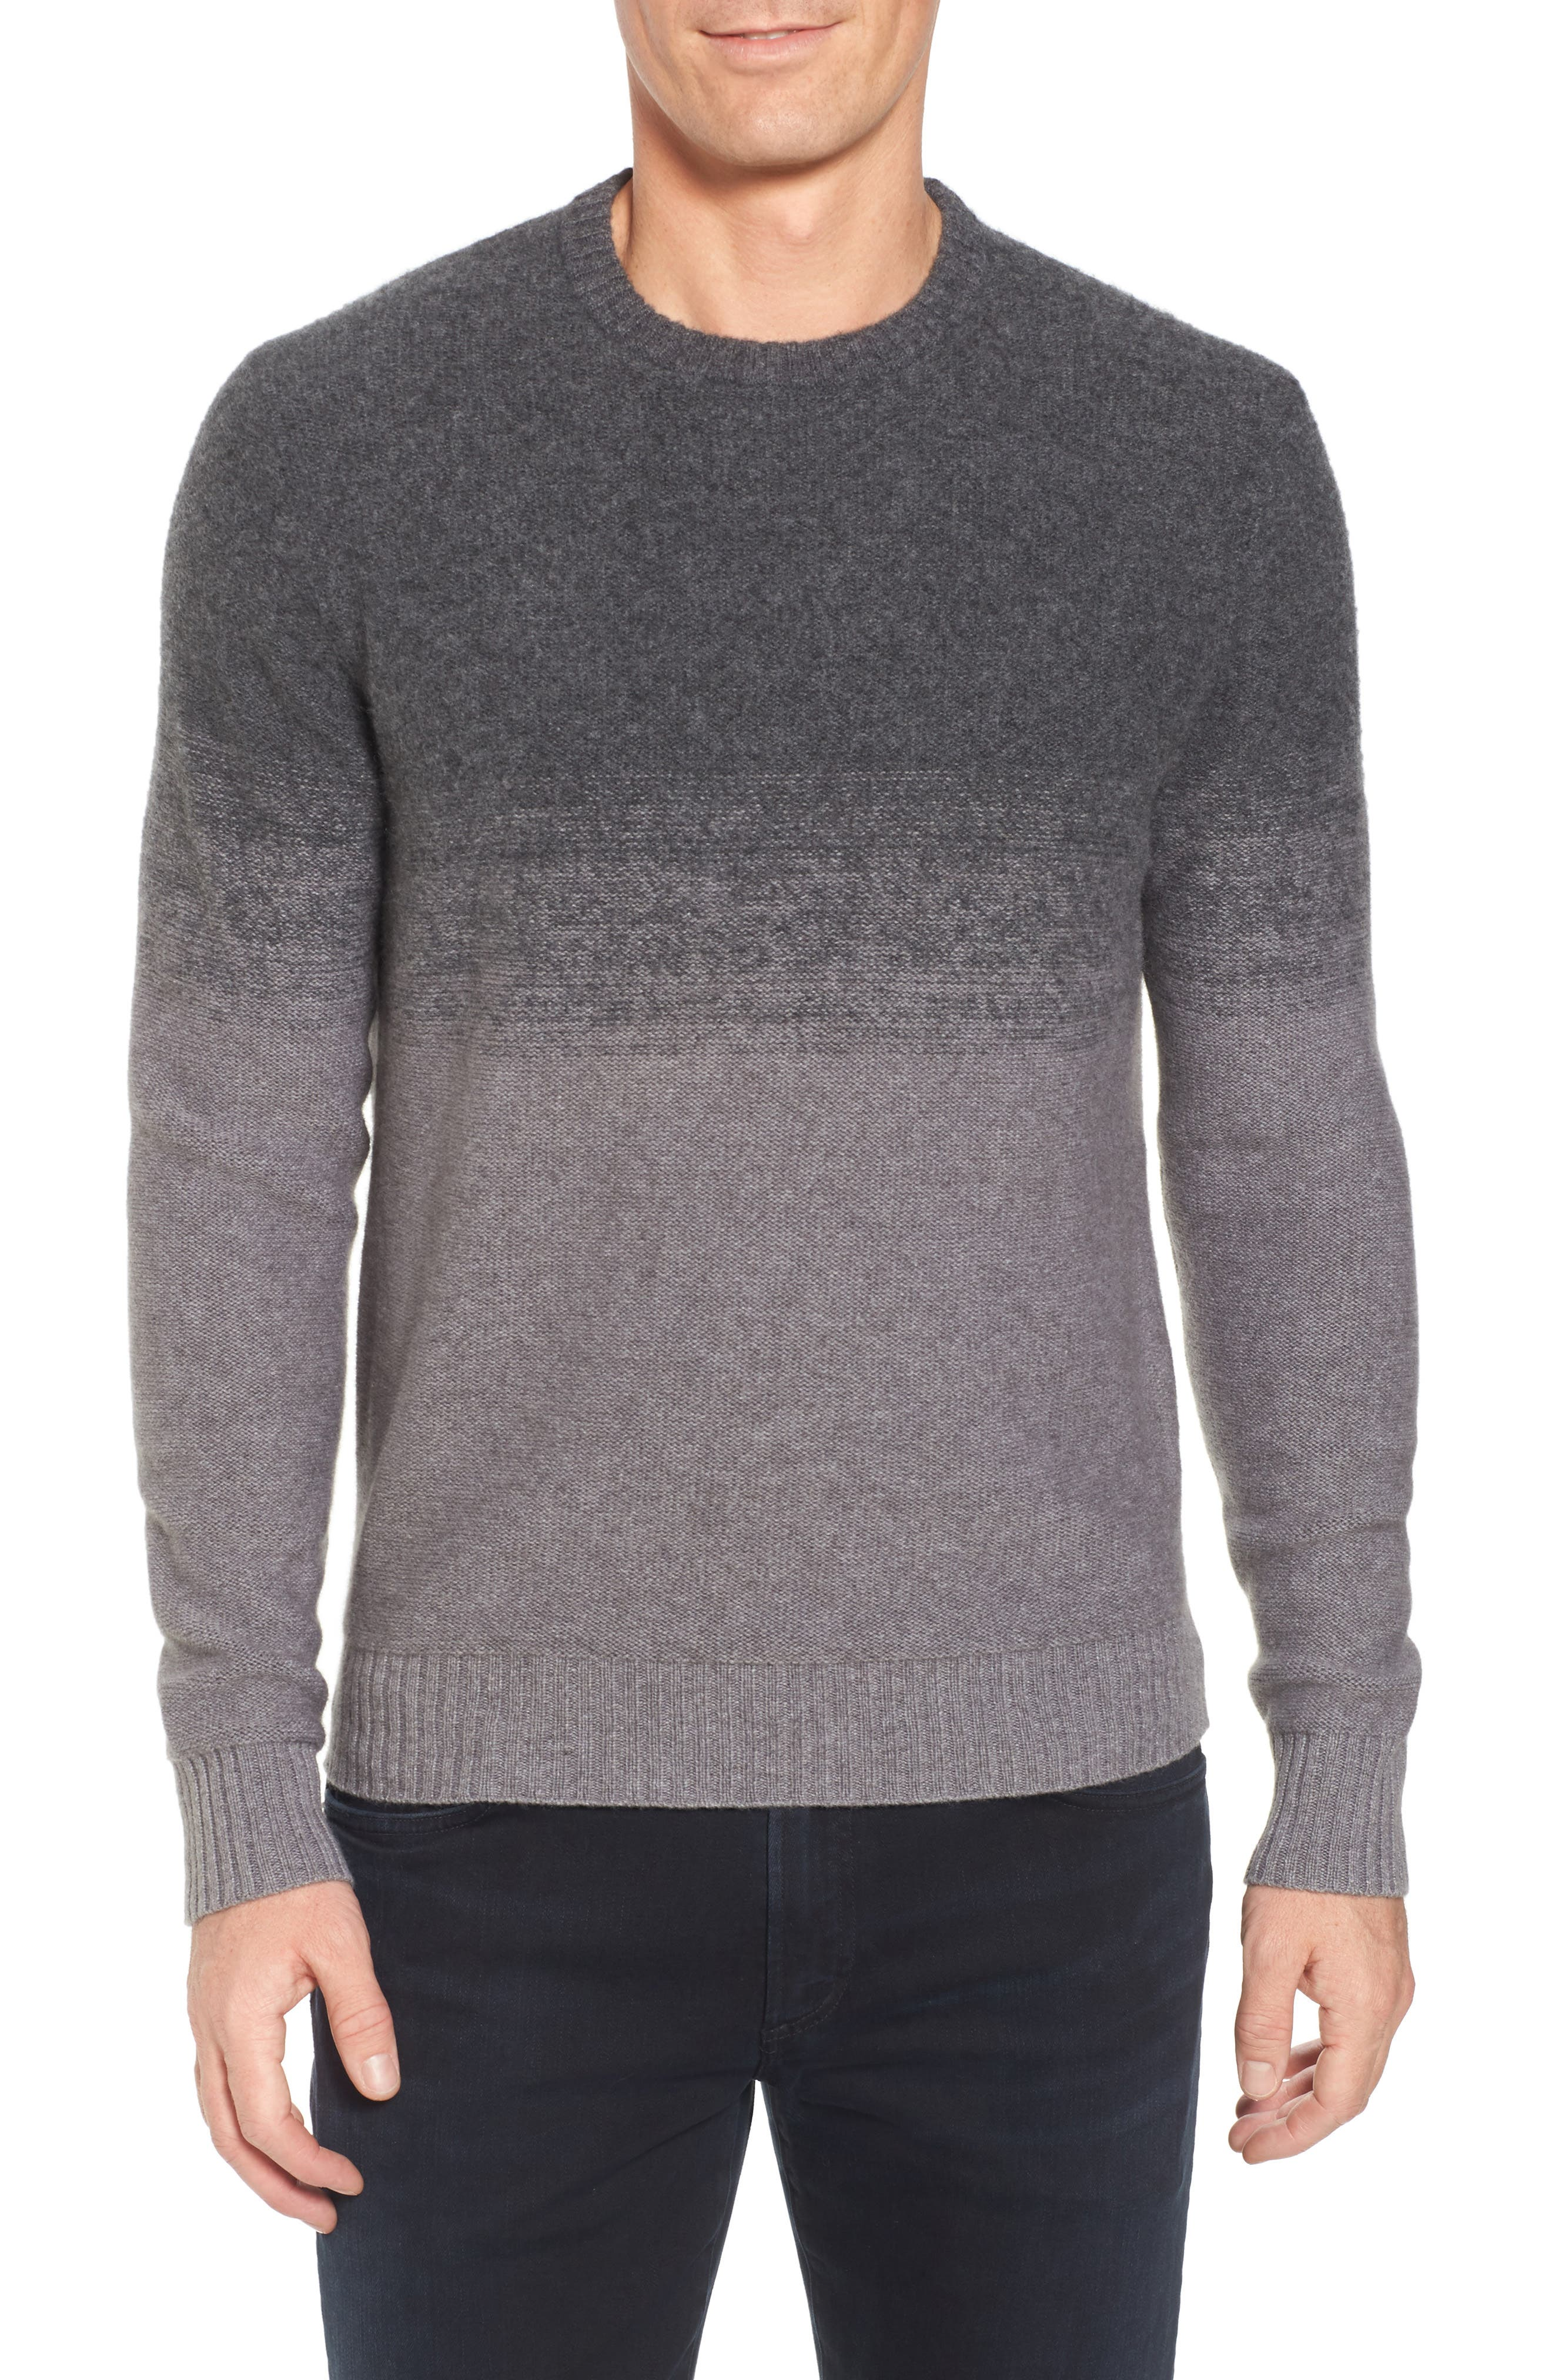 Monte Rosse Ombré Cashmere Sweater,                         Main,                         color, Grey Filigree Hthr Ombre